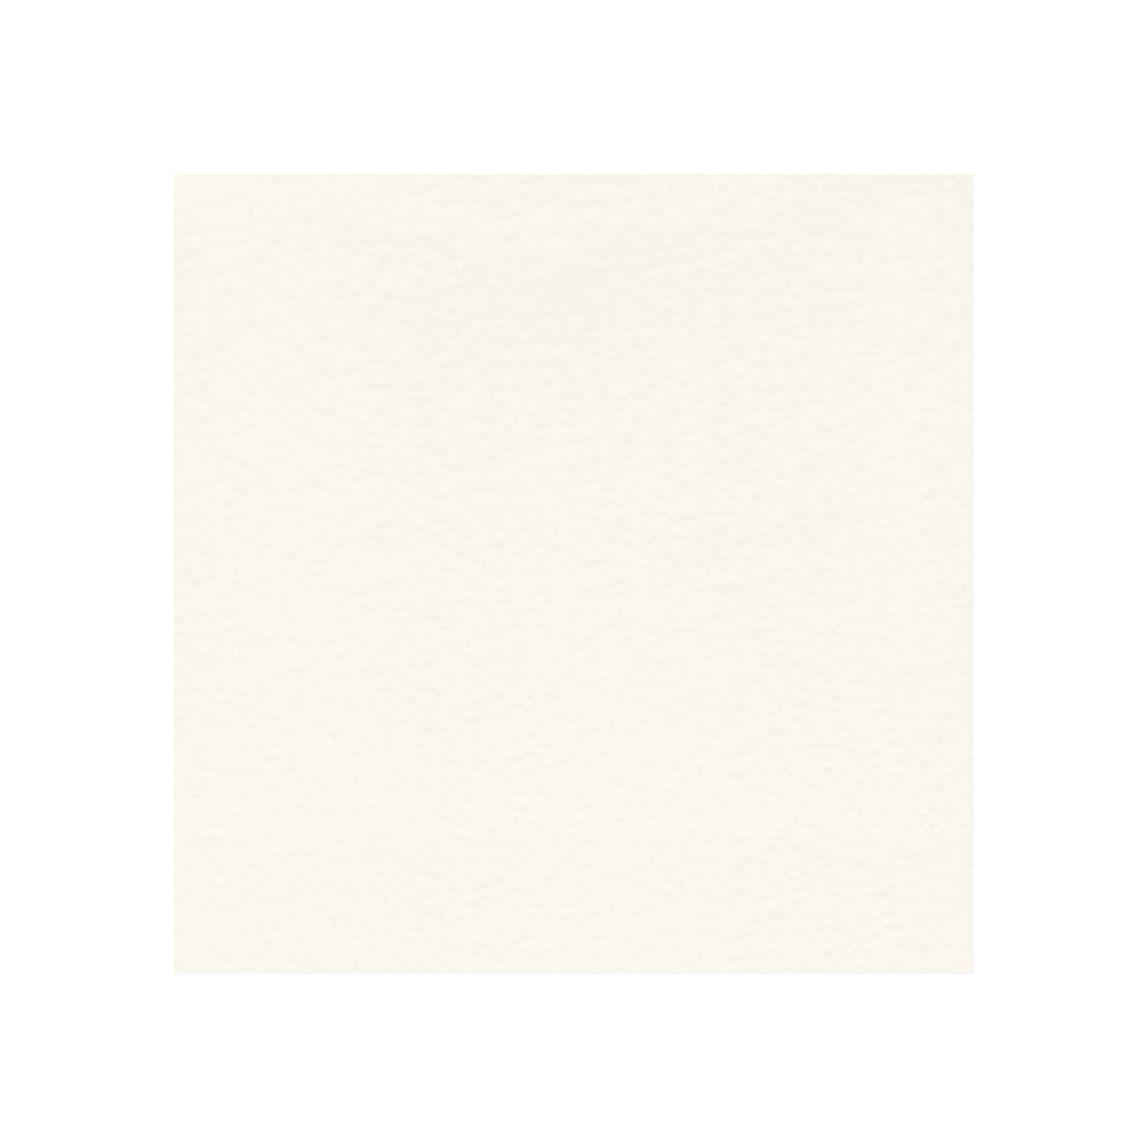 White White Swatch